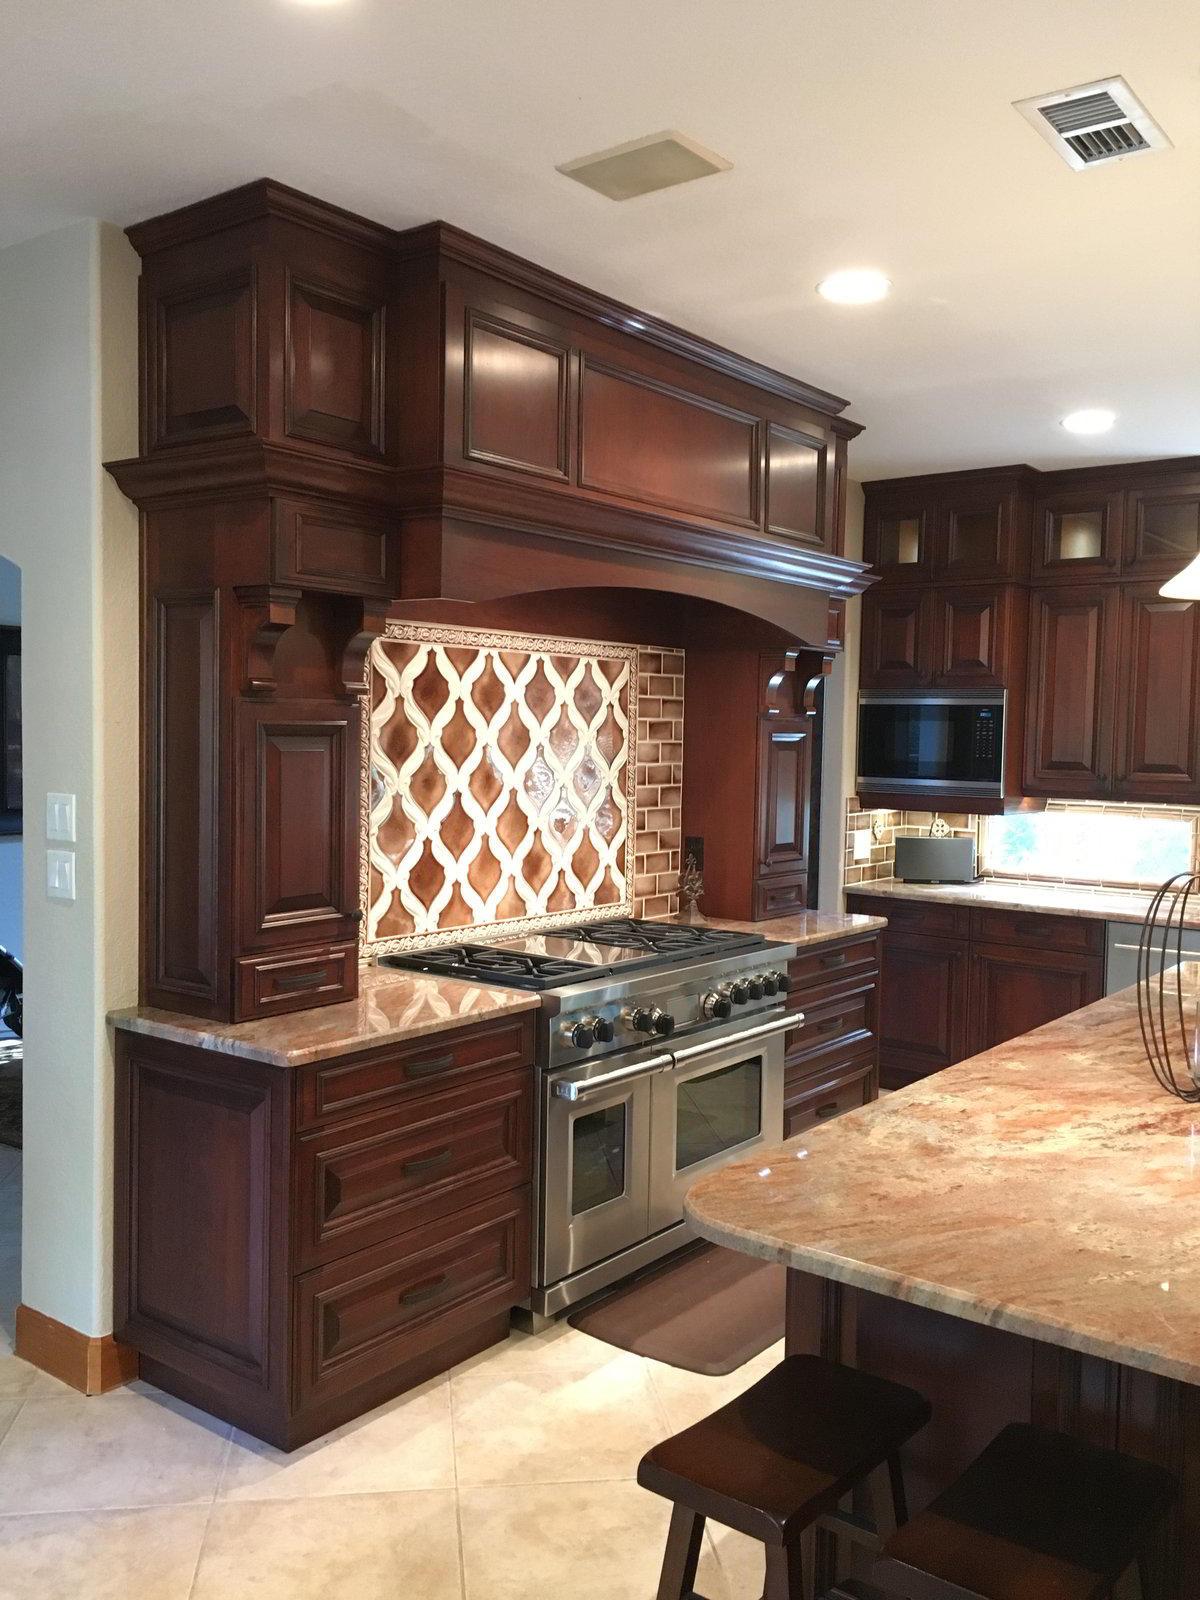 Custom Cherry Wood Cabinets in Friendship TX   Bay Area ...